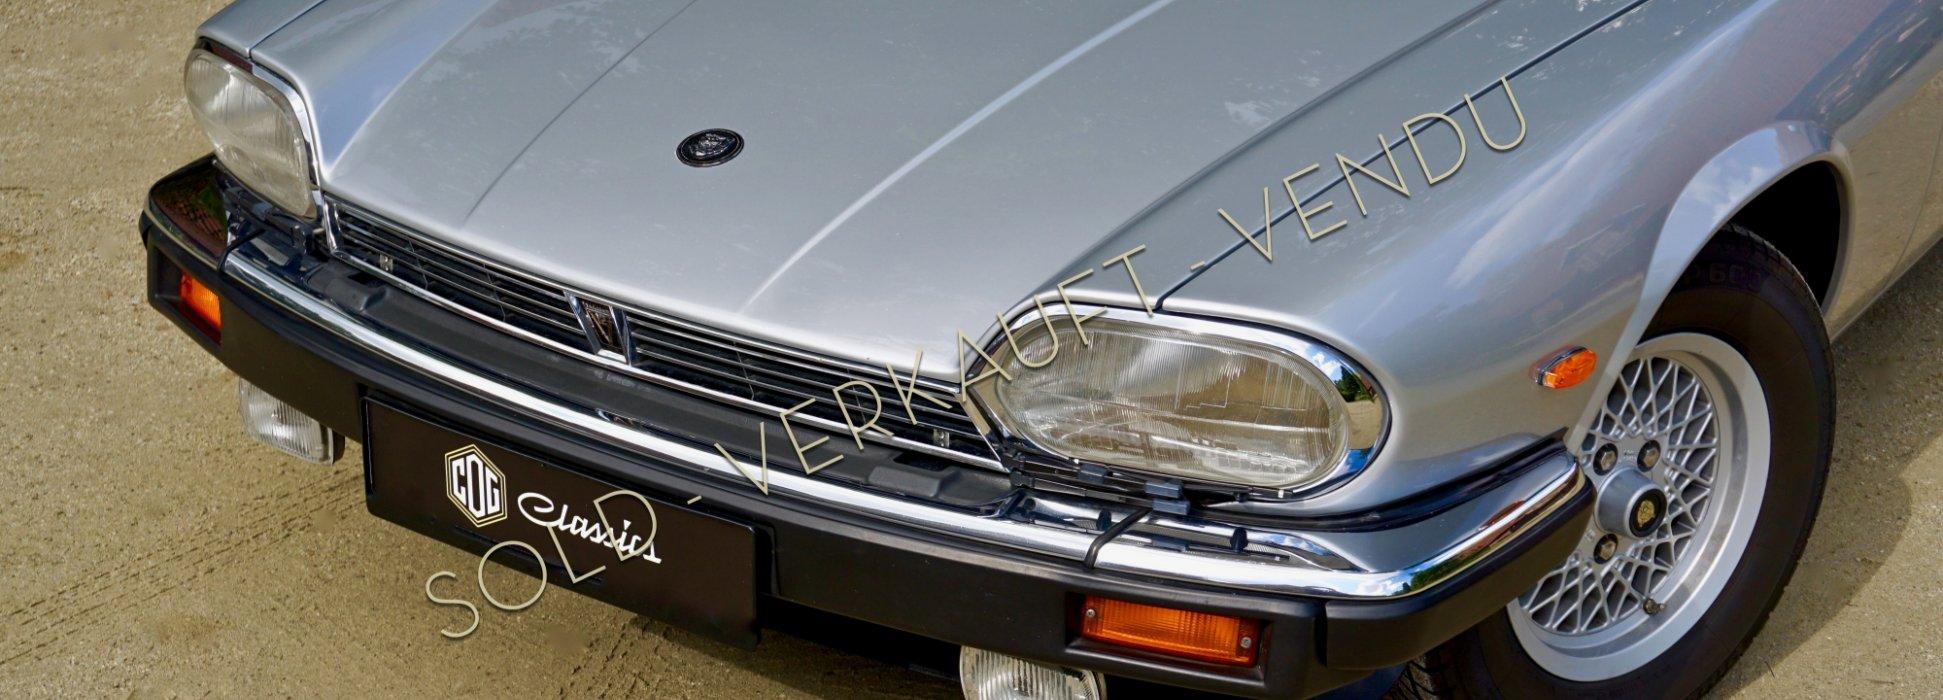 jaguar xjs v12 convertible deutsches fahrzeug verkauft